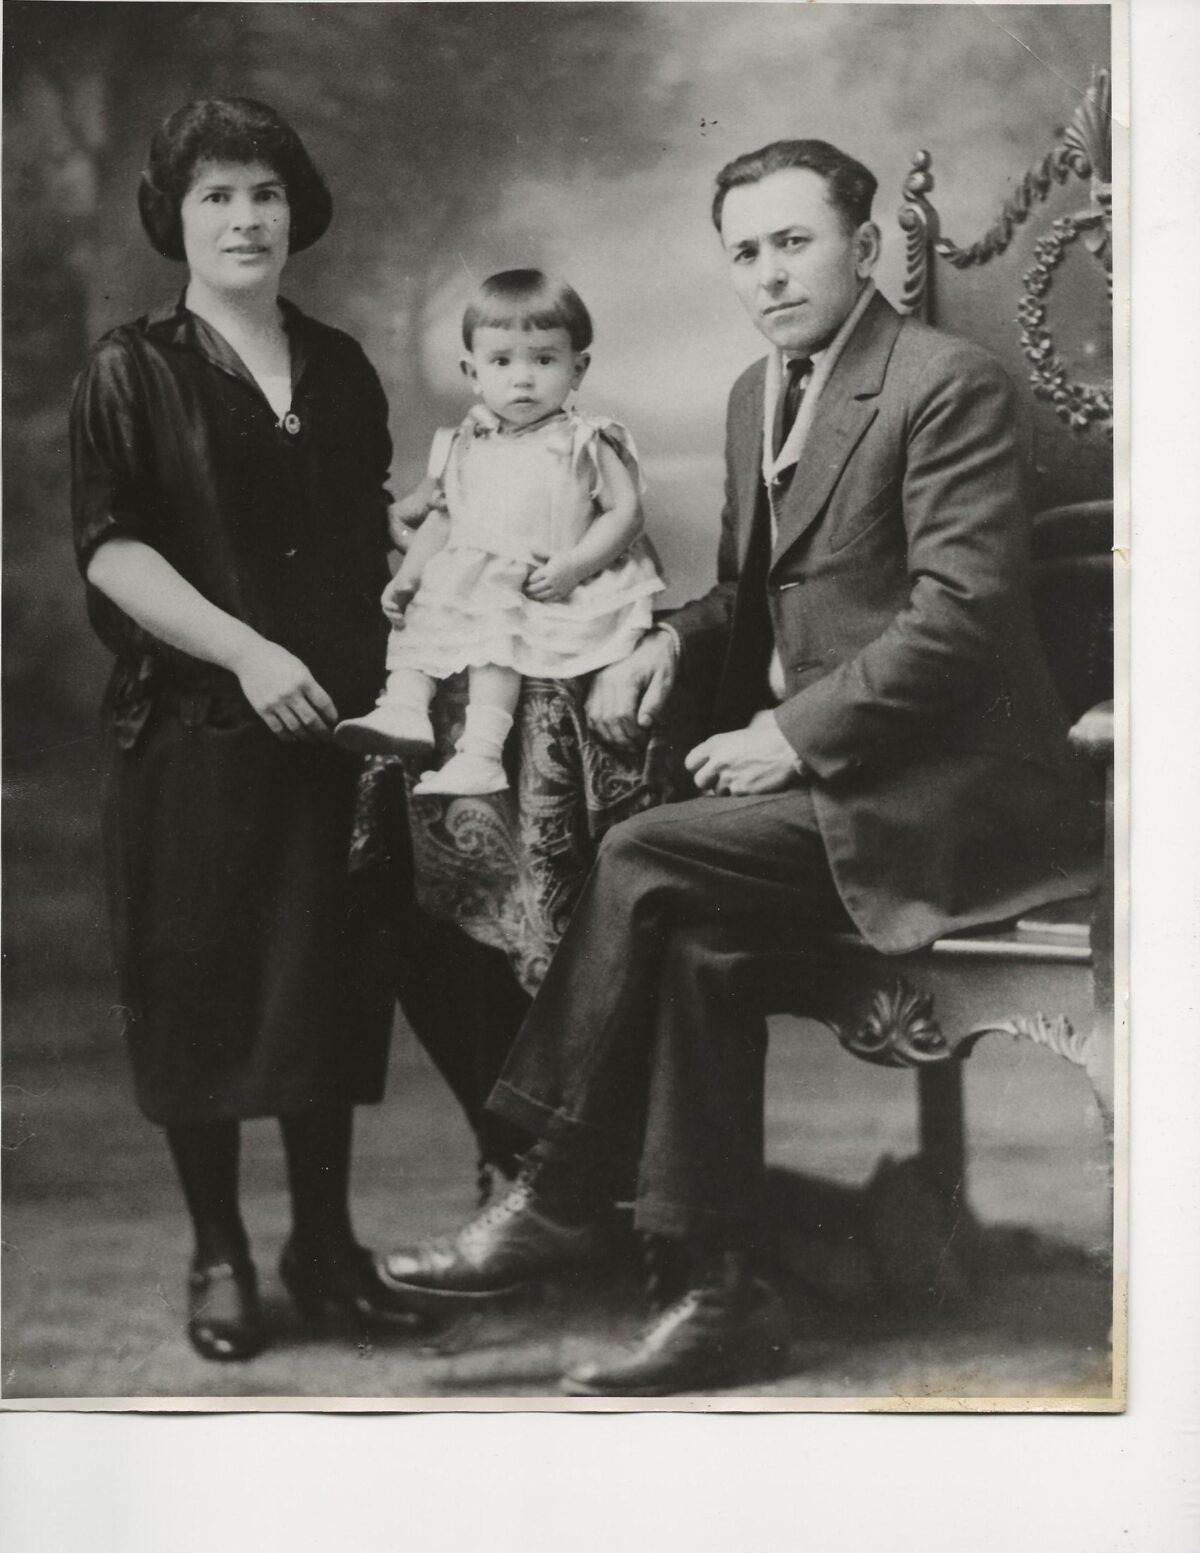 Angelina Botter, Vincenzo Giovanditto & Antoniette Giovanditto, Guelph, Ontario, 1929